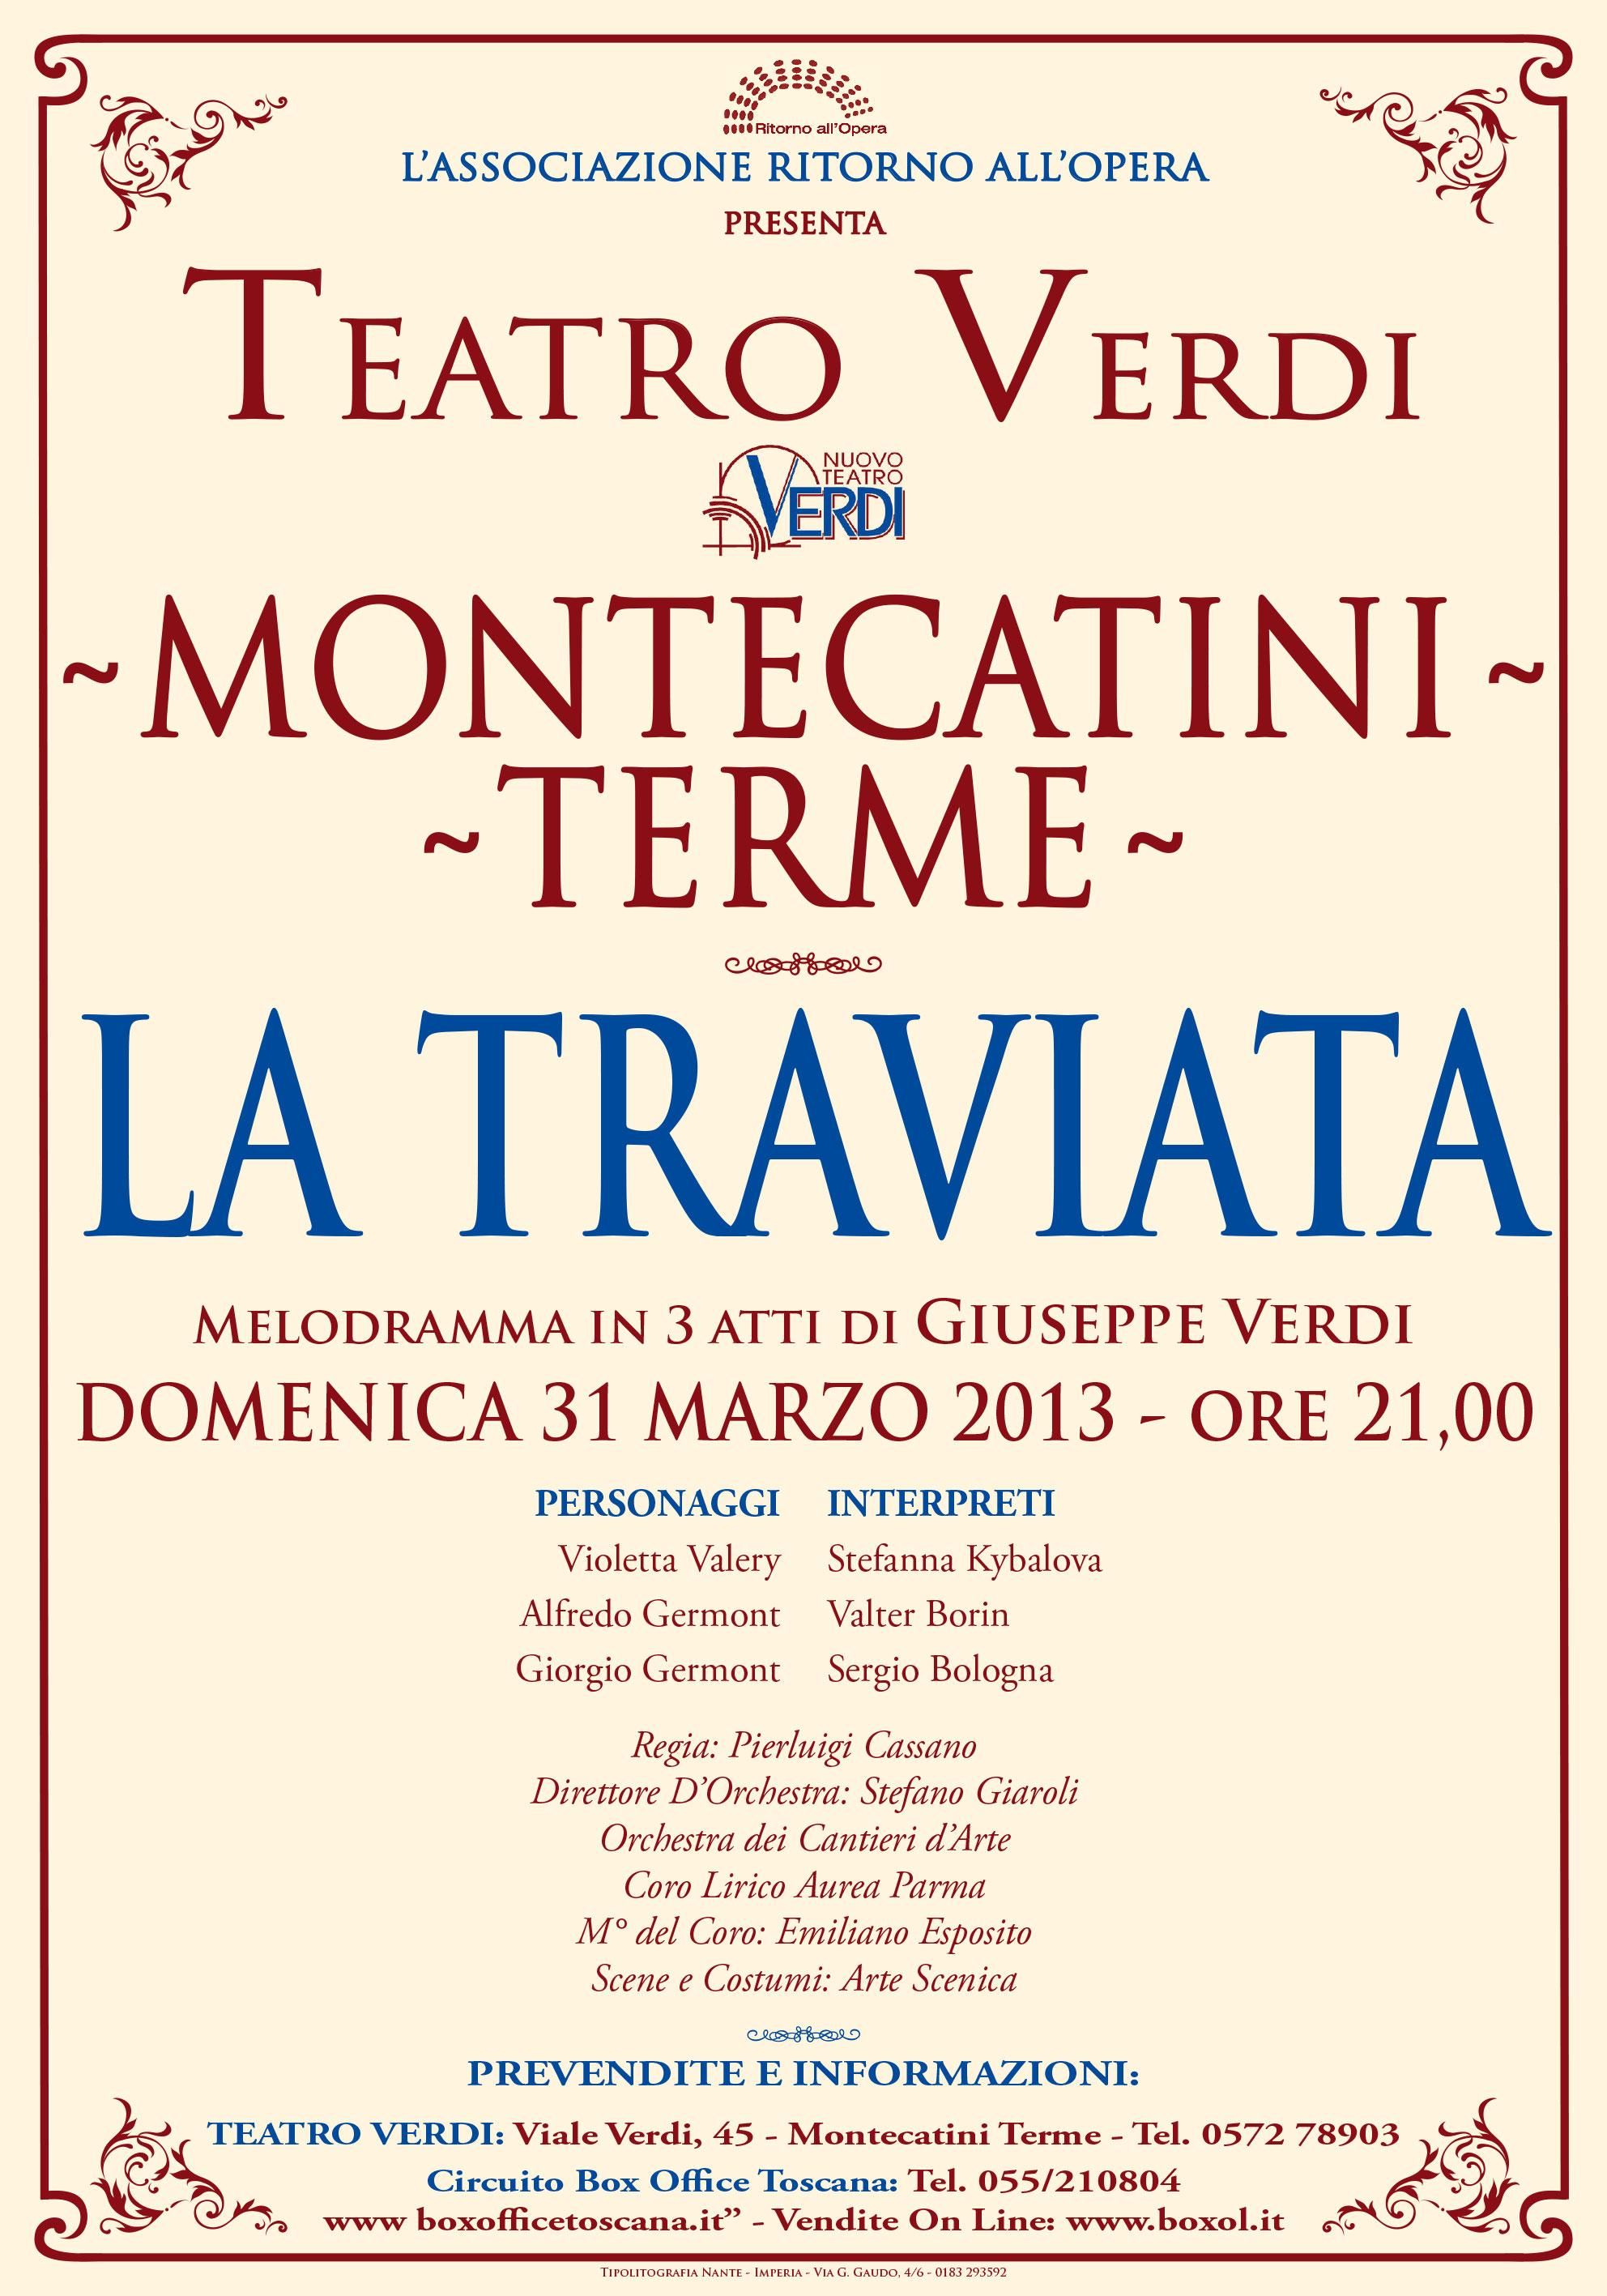 manifesto-la-traviata-montecatini